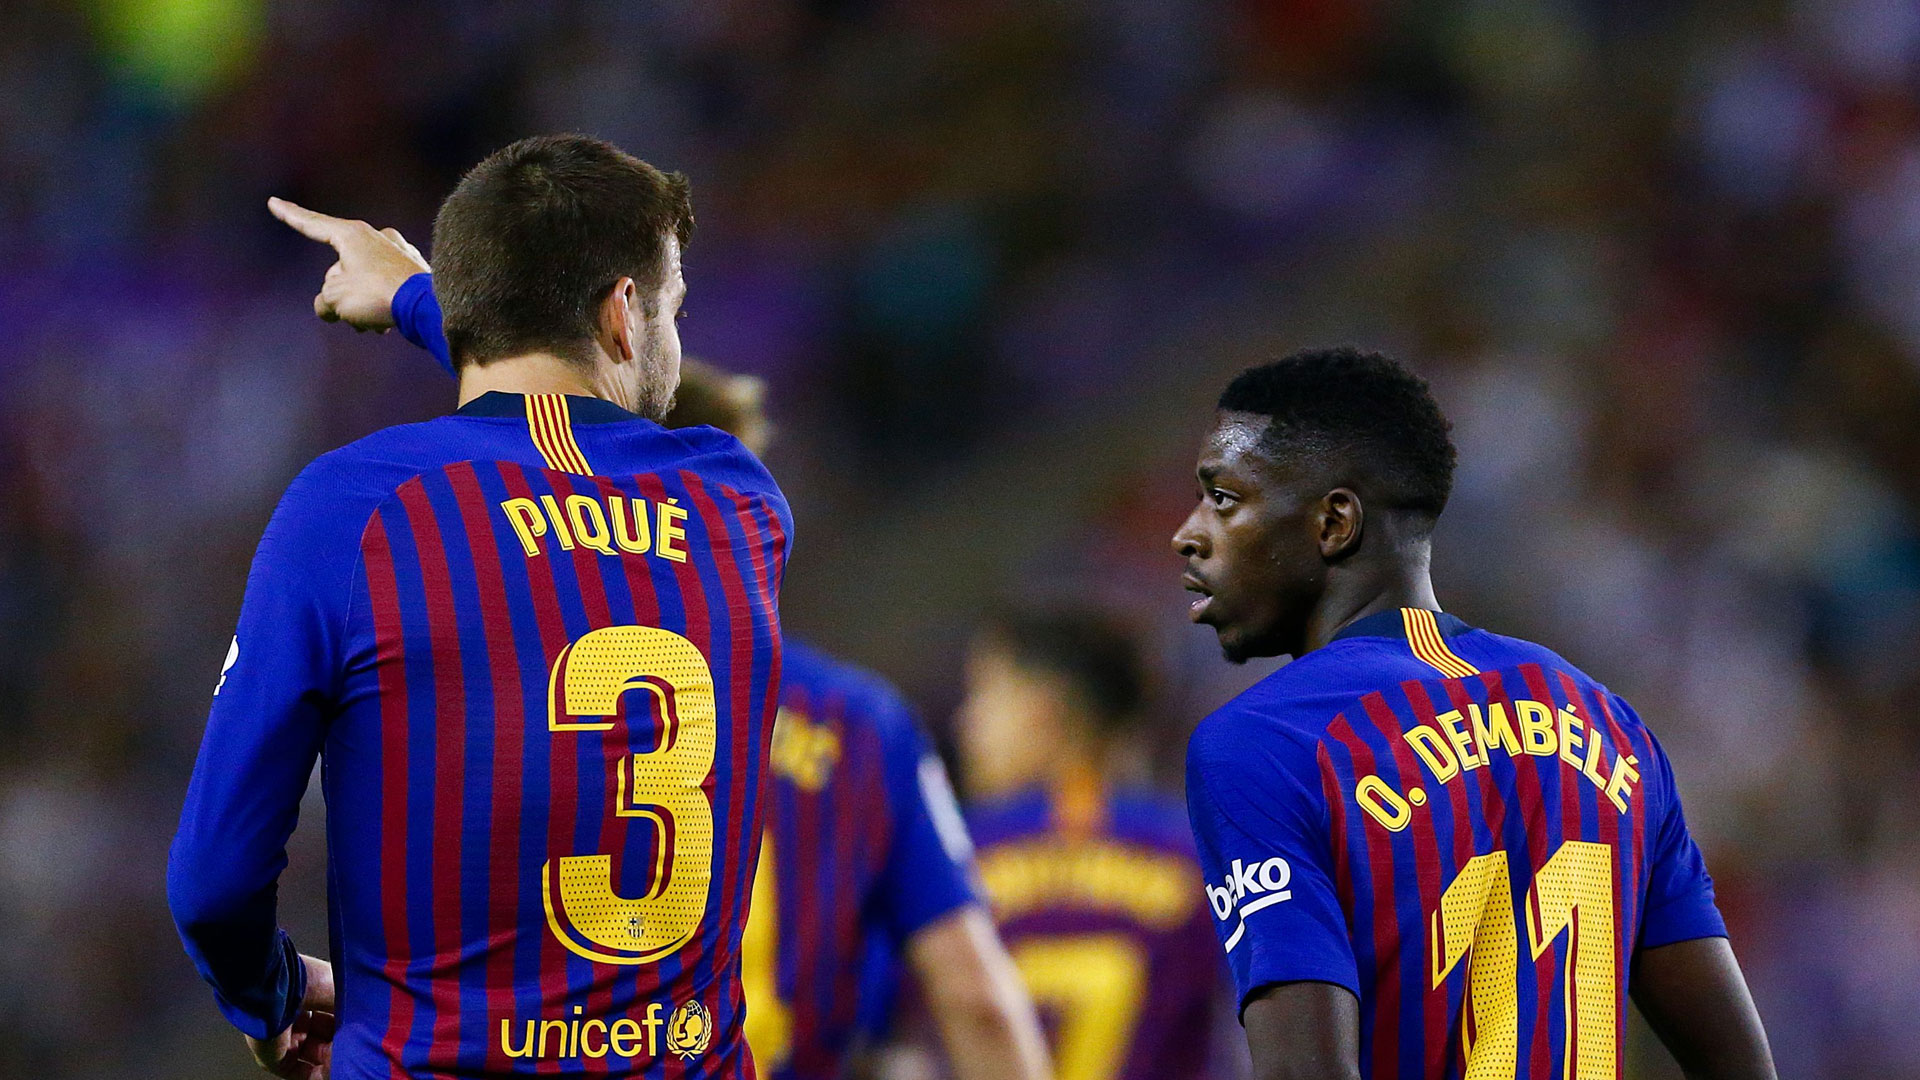 Gerard Pique Ousmane Dembele FC Barcelona 25082018